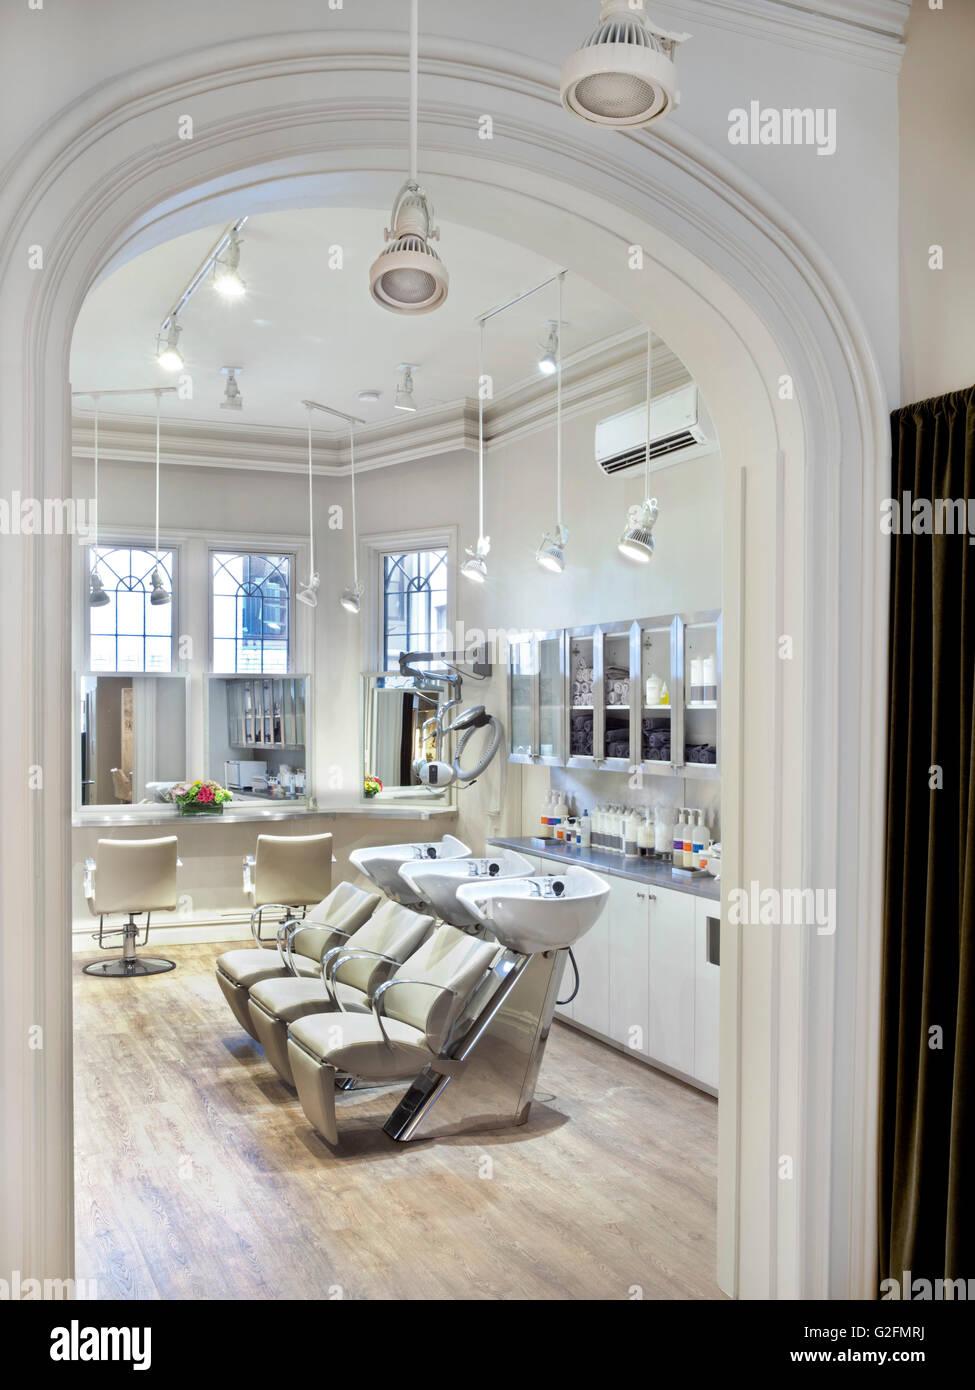 Beauty salon - Stock Image